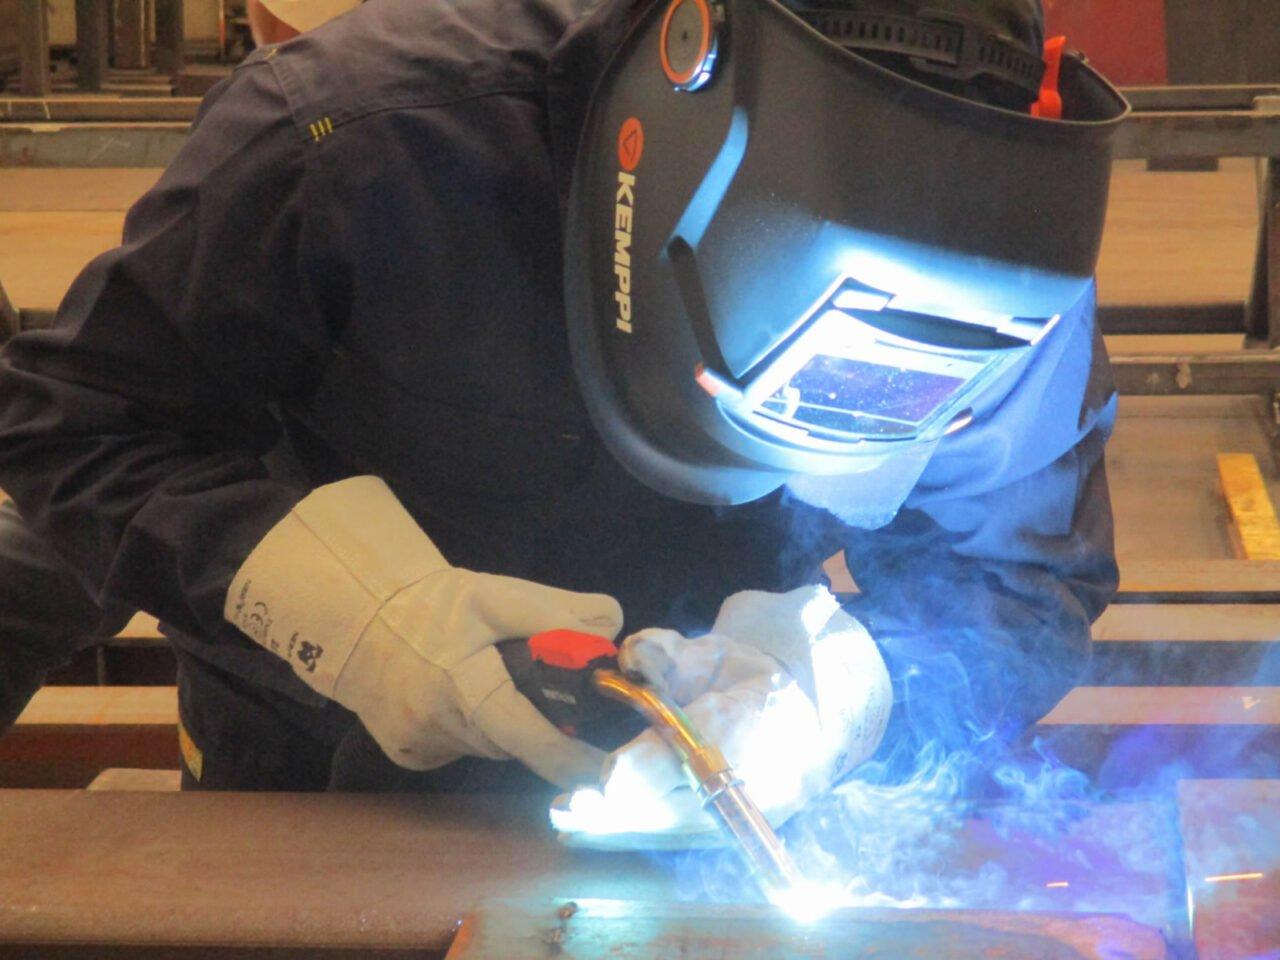 Assembling and Welding